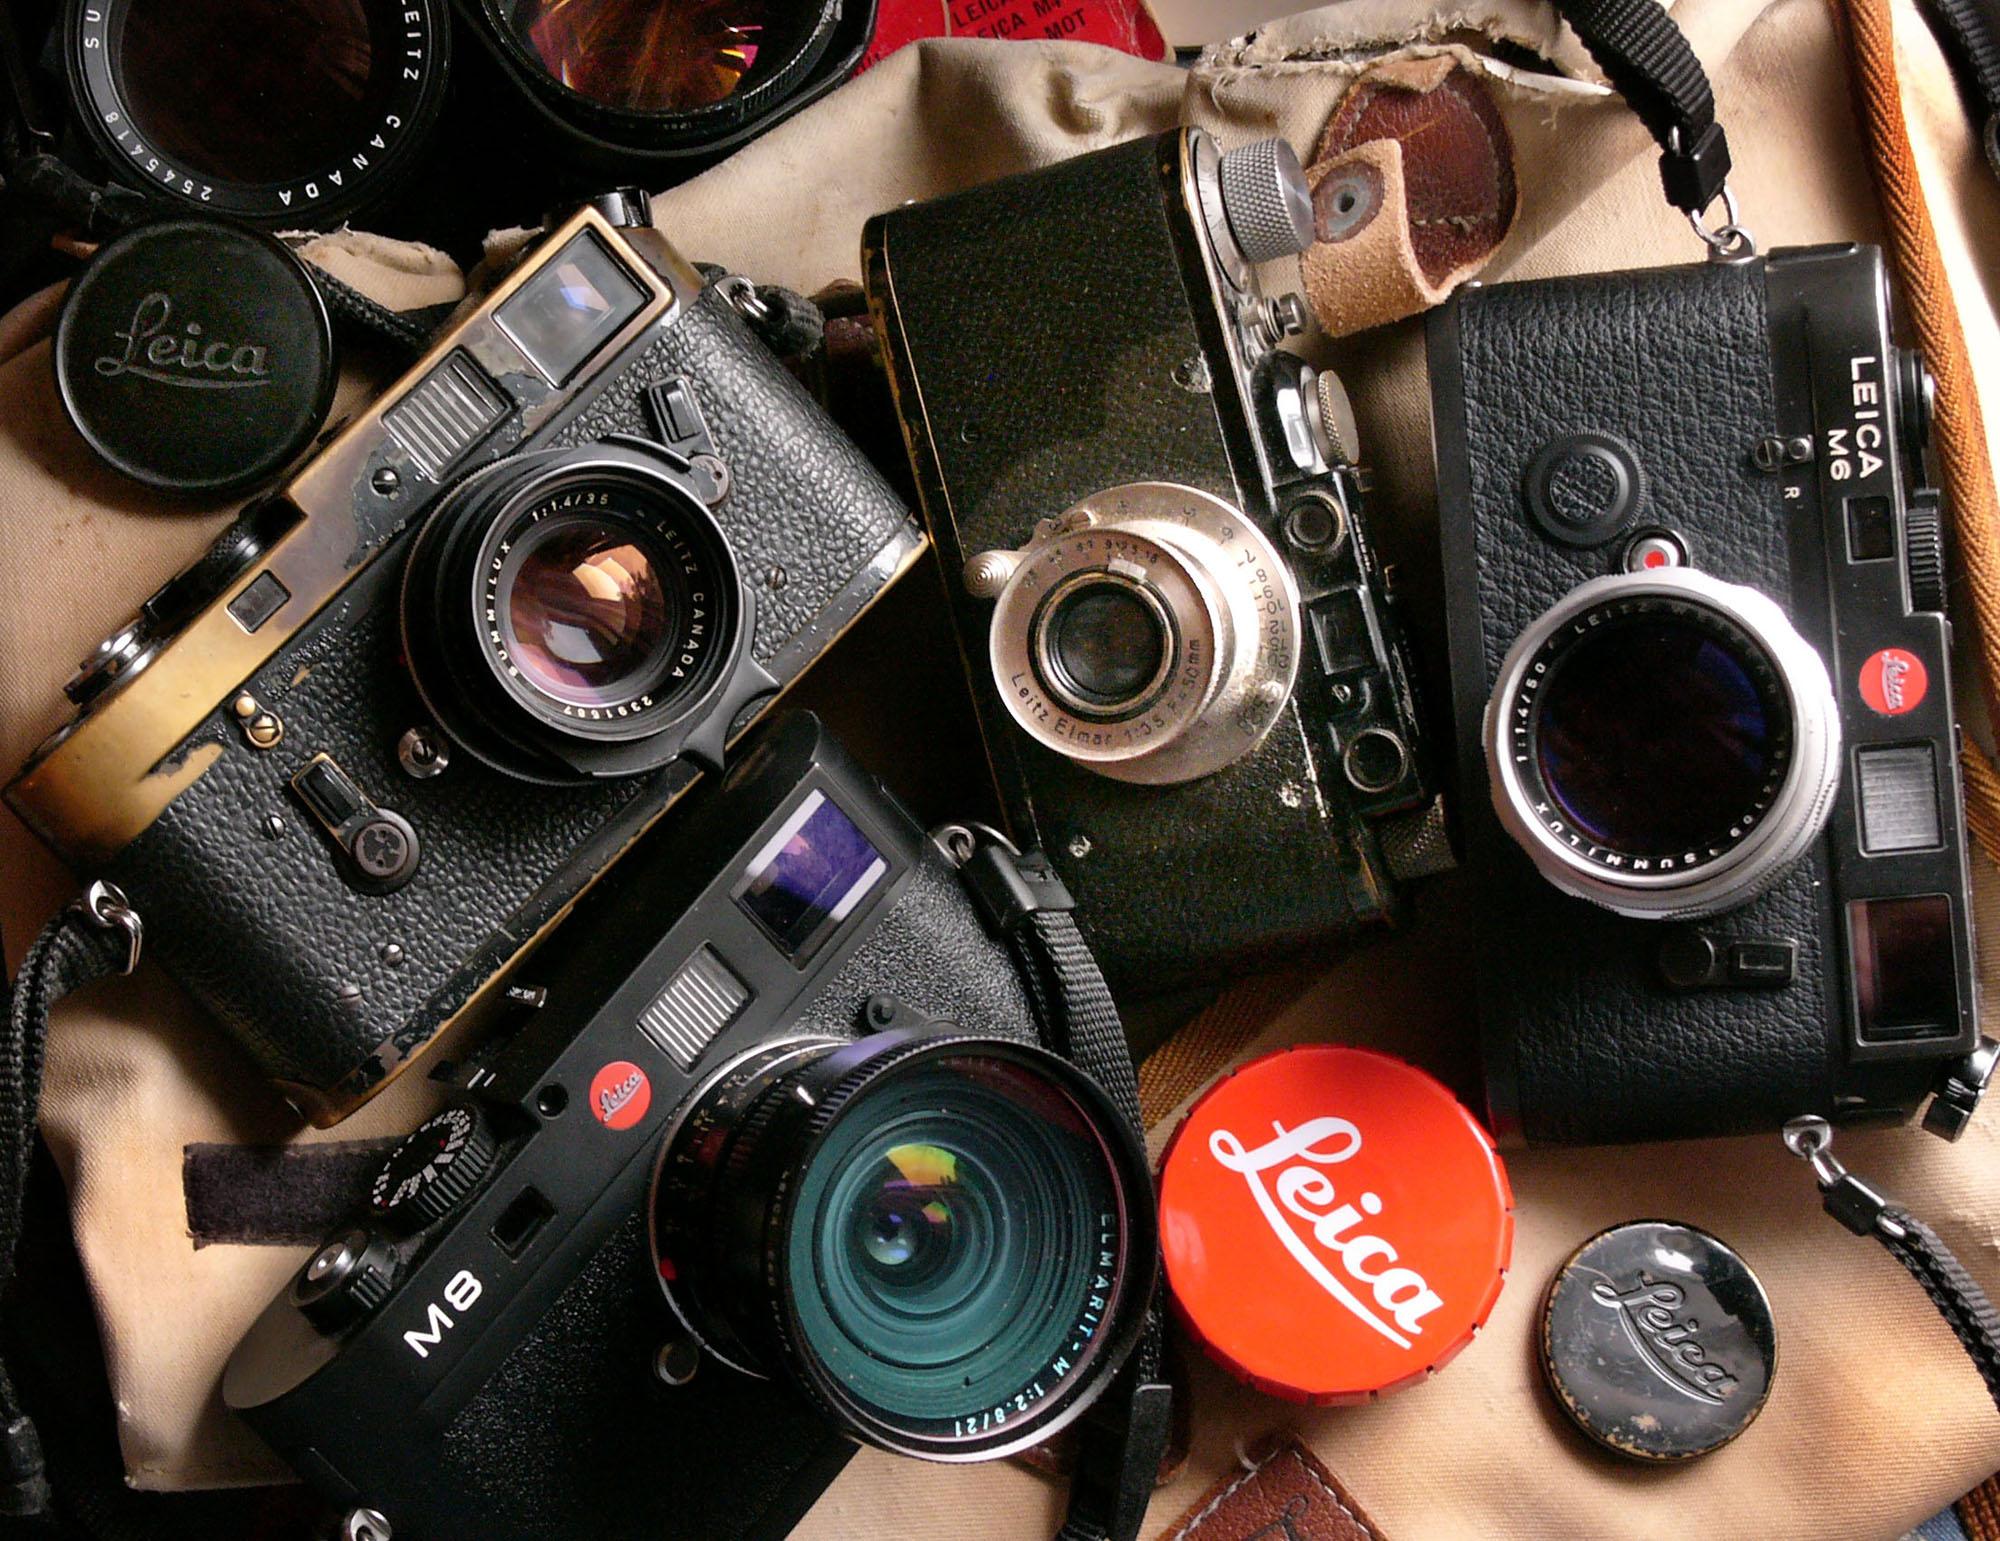 LeicaDesktop.jpg